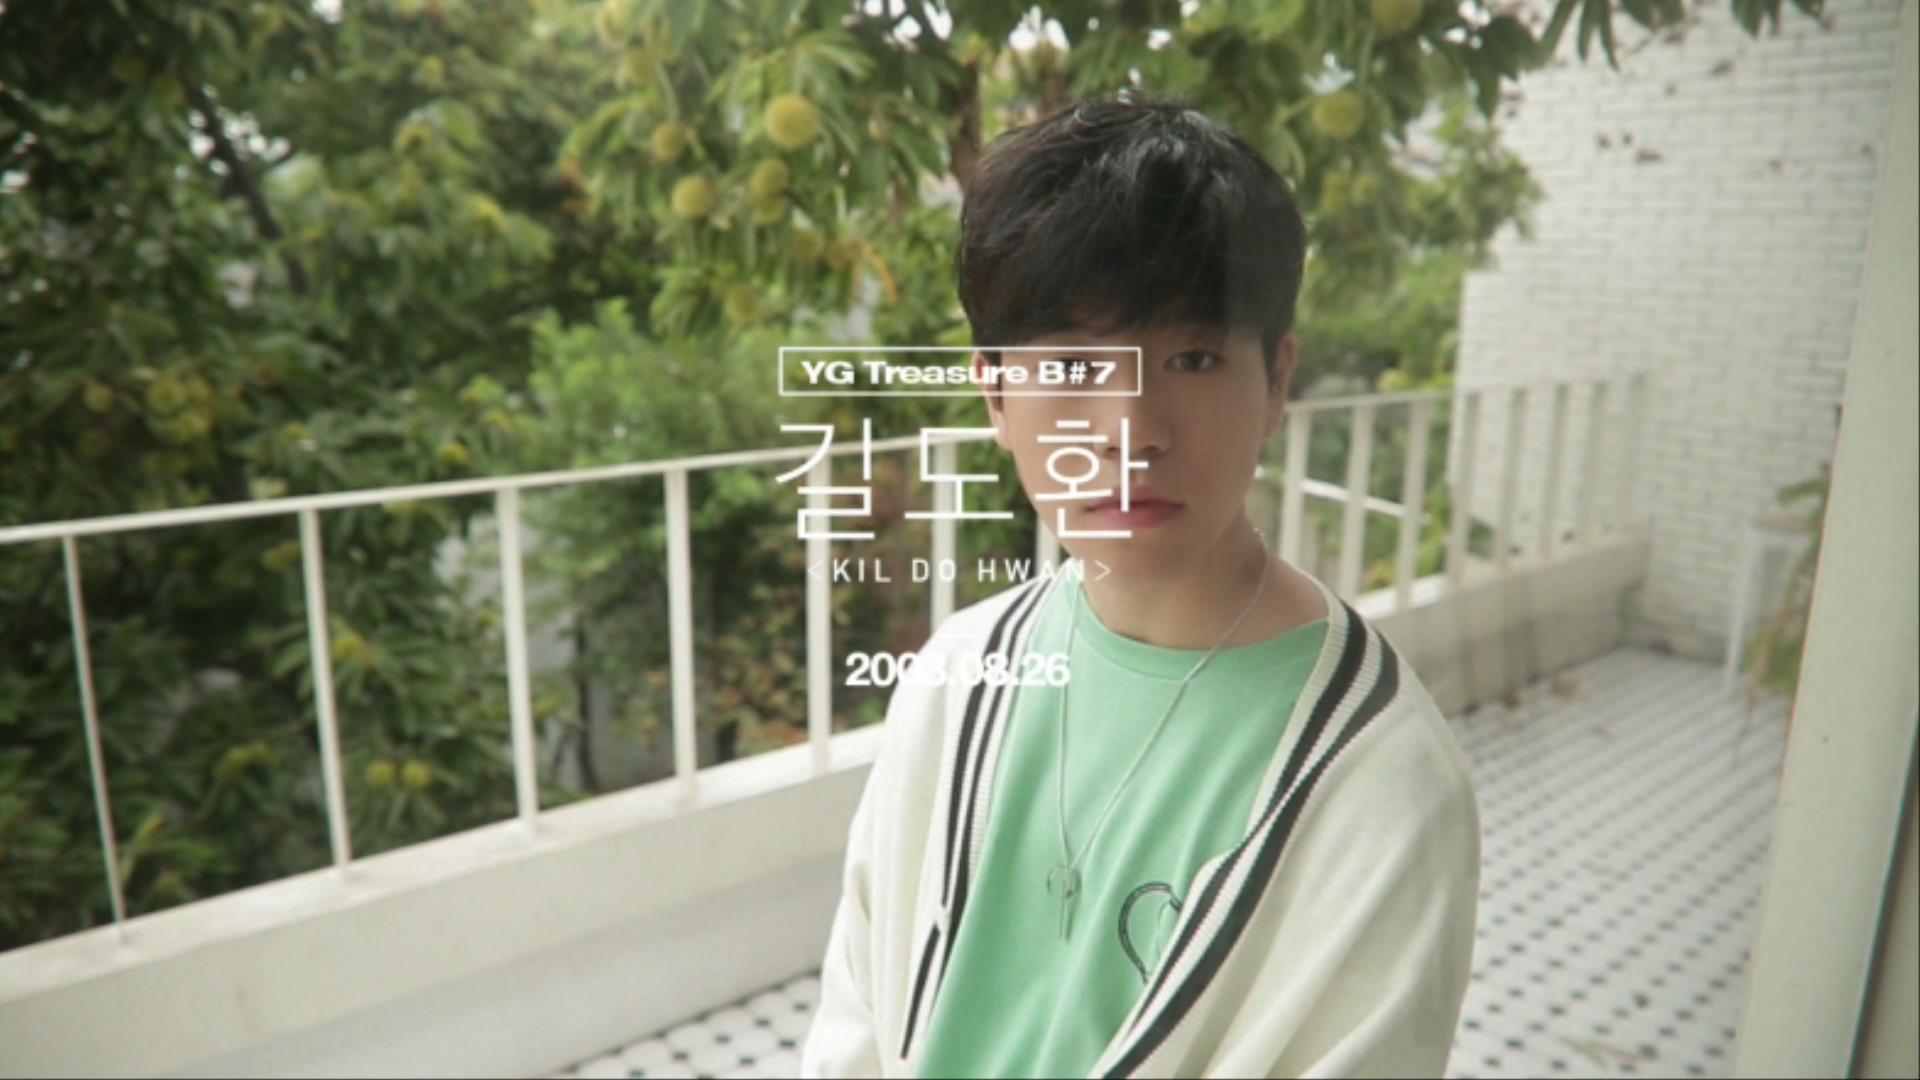 YG보석함ㅣB#8 길도환 <KIL DOHWAN> PROFILE MAKING FILM